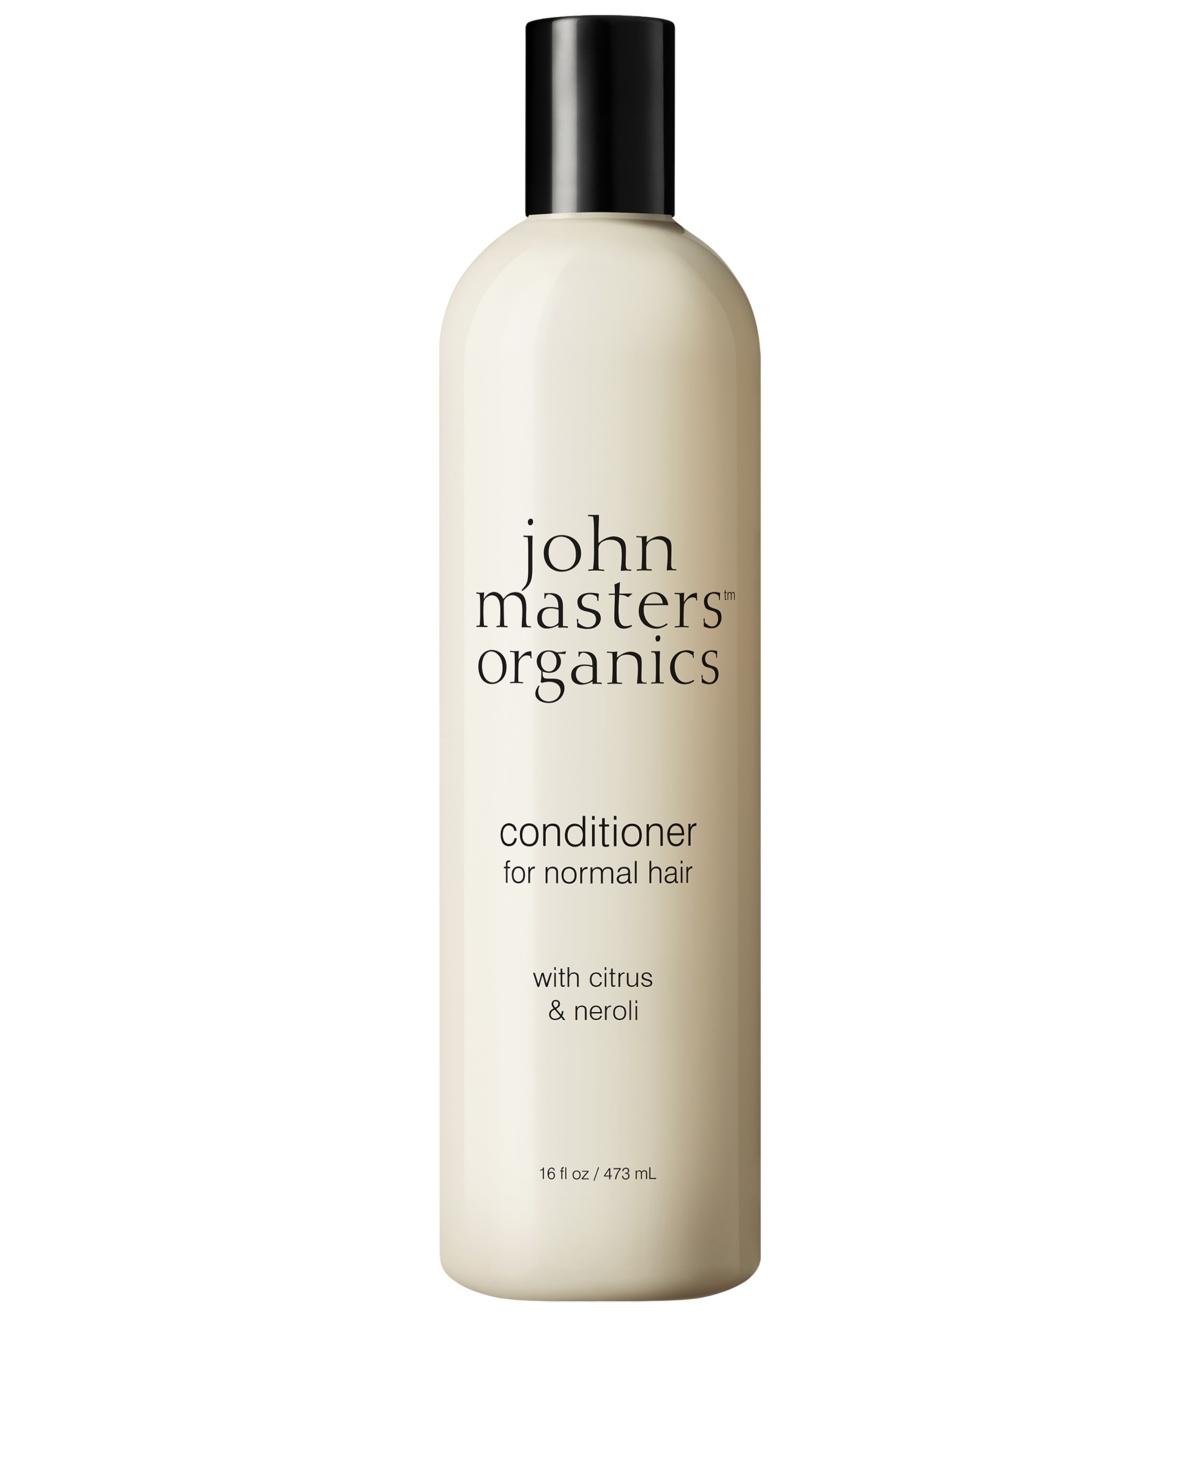 John Masters Organics Conditioner for Normal Hair with Citrus Neroli- 16 fl. oz.